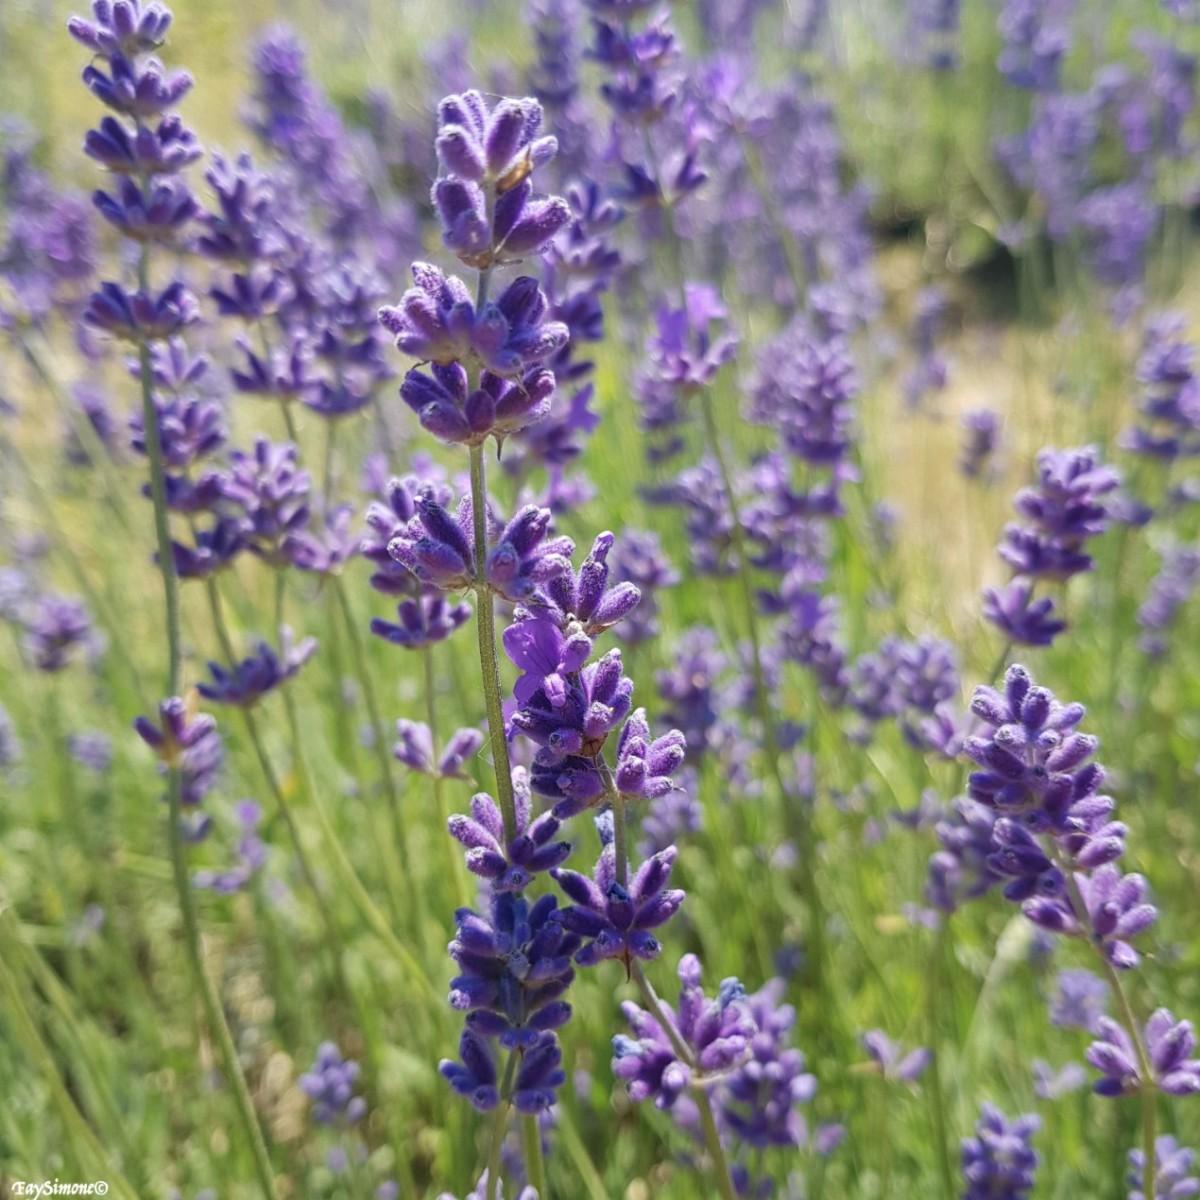 Blogging, Blog, Lifestyle, Fay Simone, Blogger, Mayfield Lavender Fields, Lavender Fields